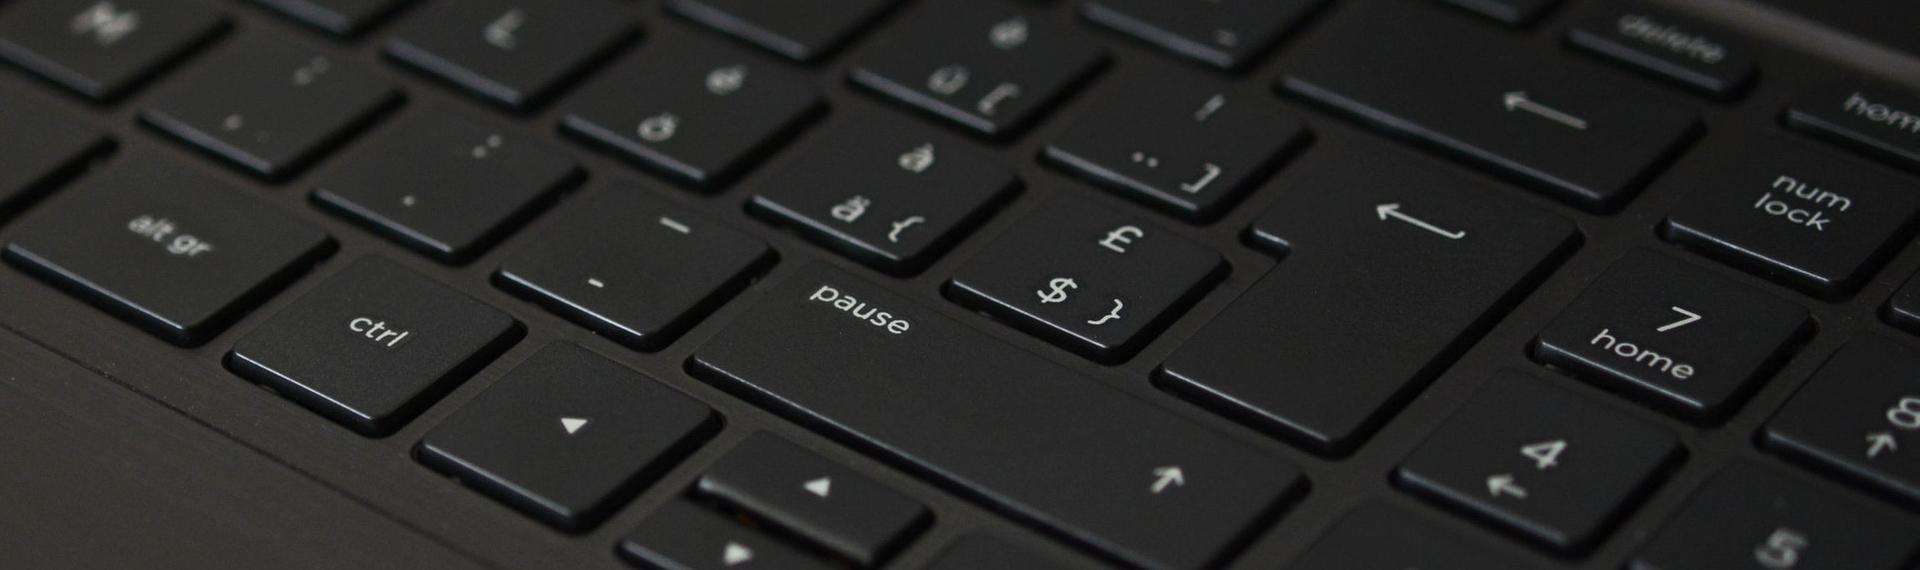 5 Cara Bikin Keyboard Laptop Kamu Lebih Awet